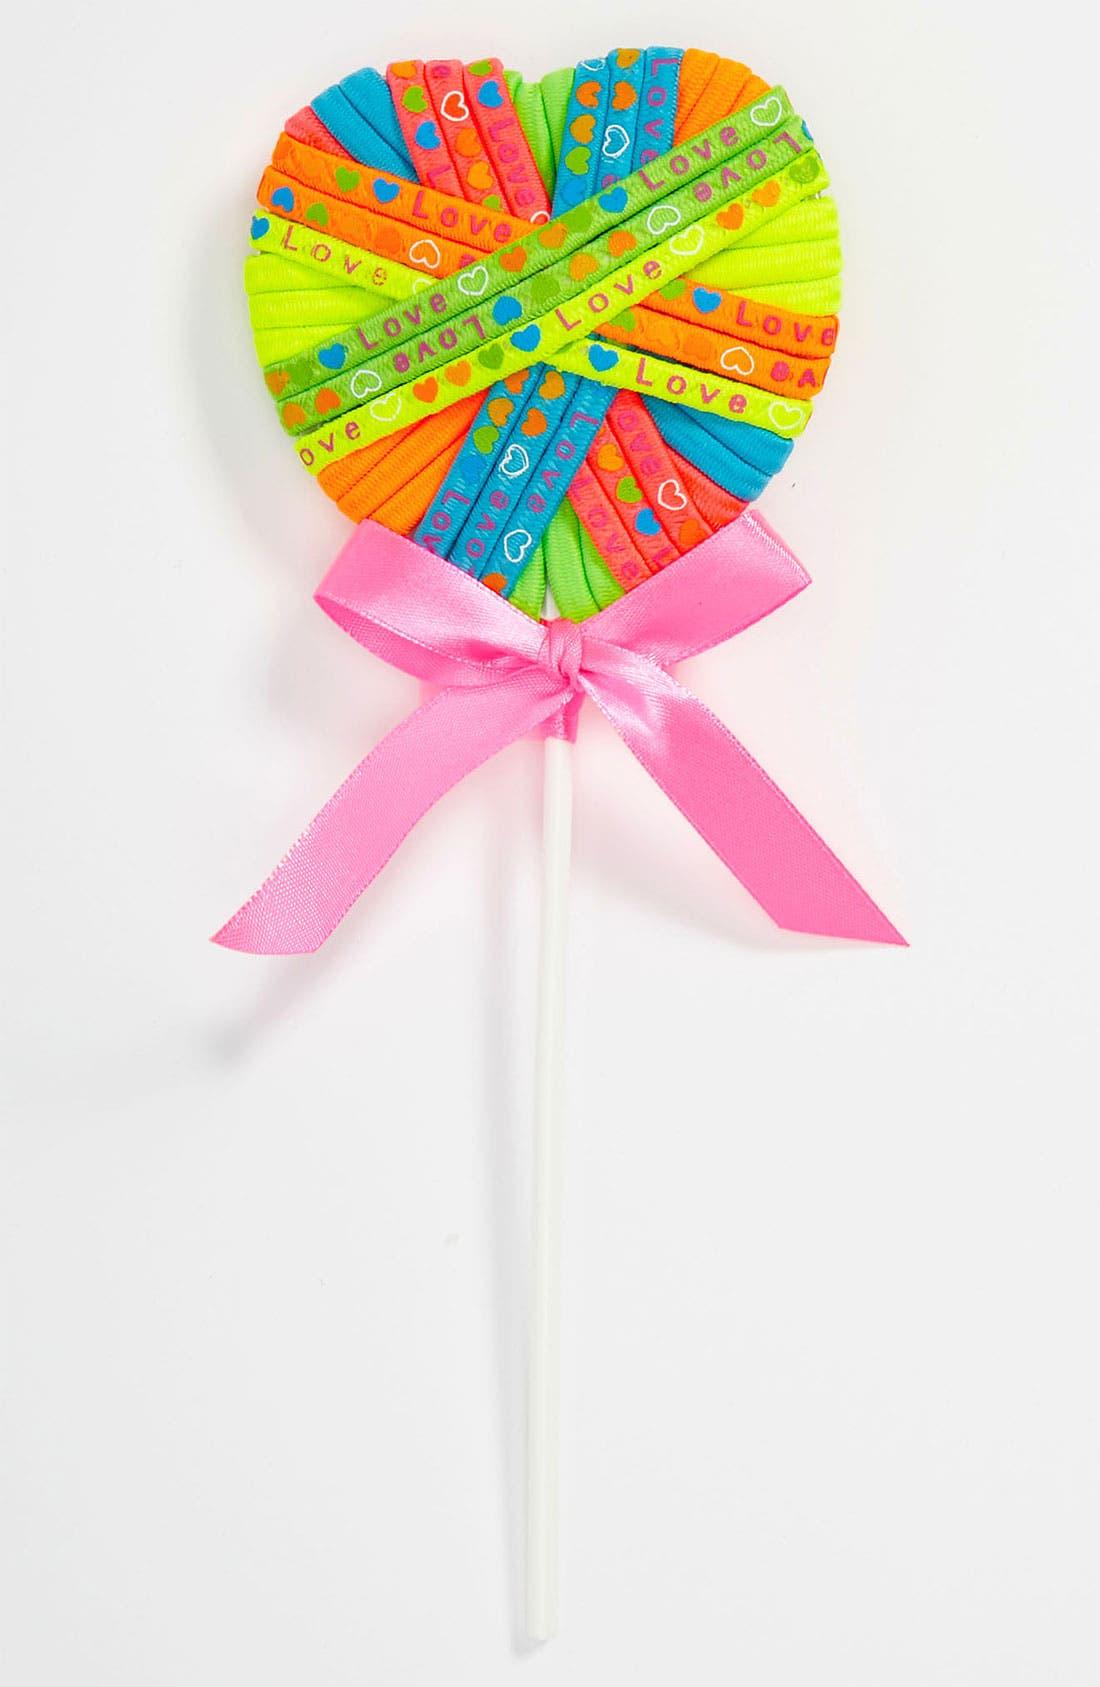 Main Image - Capelli of New York Heart Shape Lollipop Ponytail Holder Set (Girls)